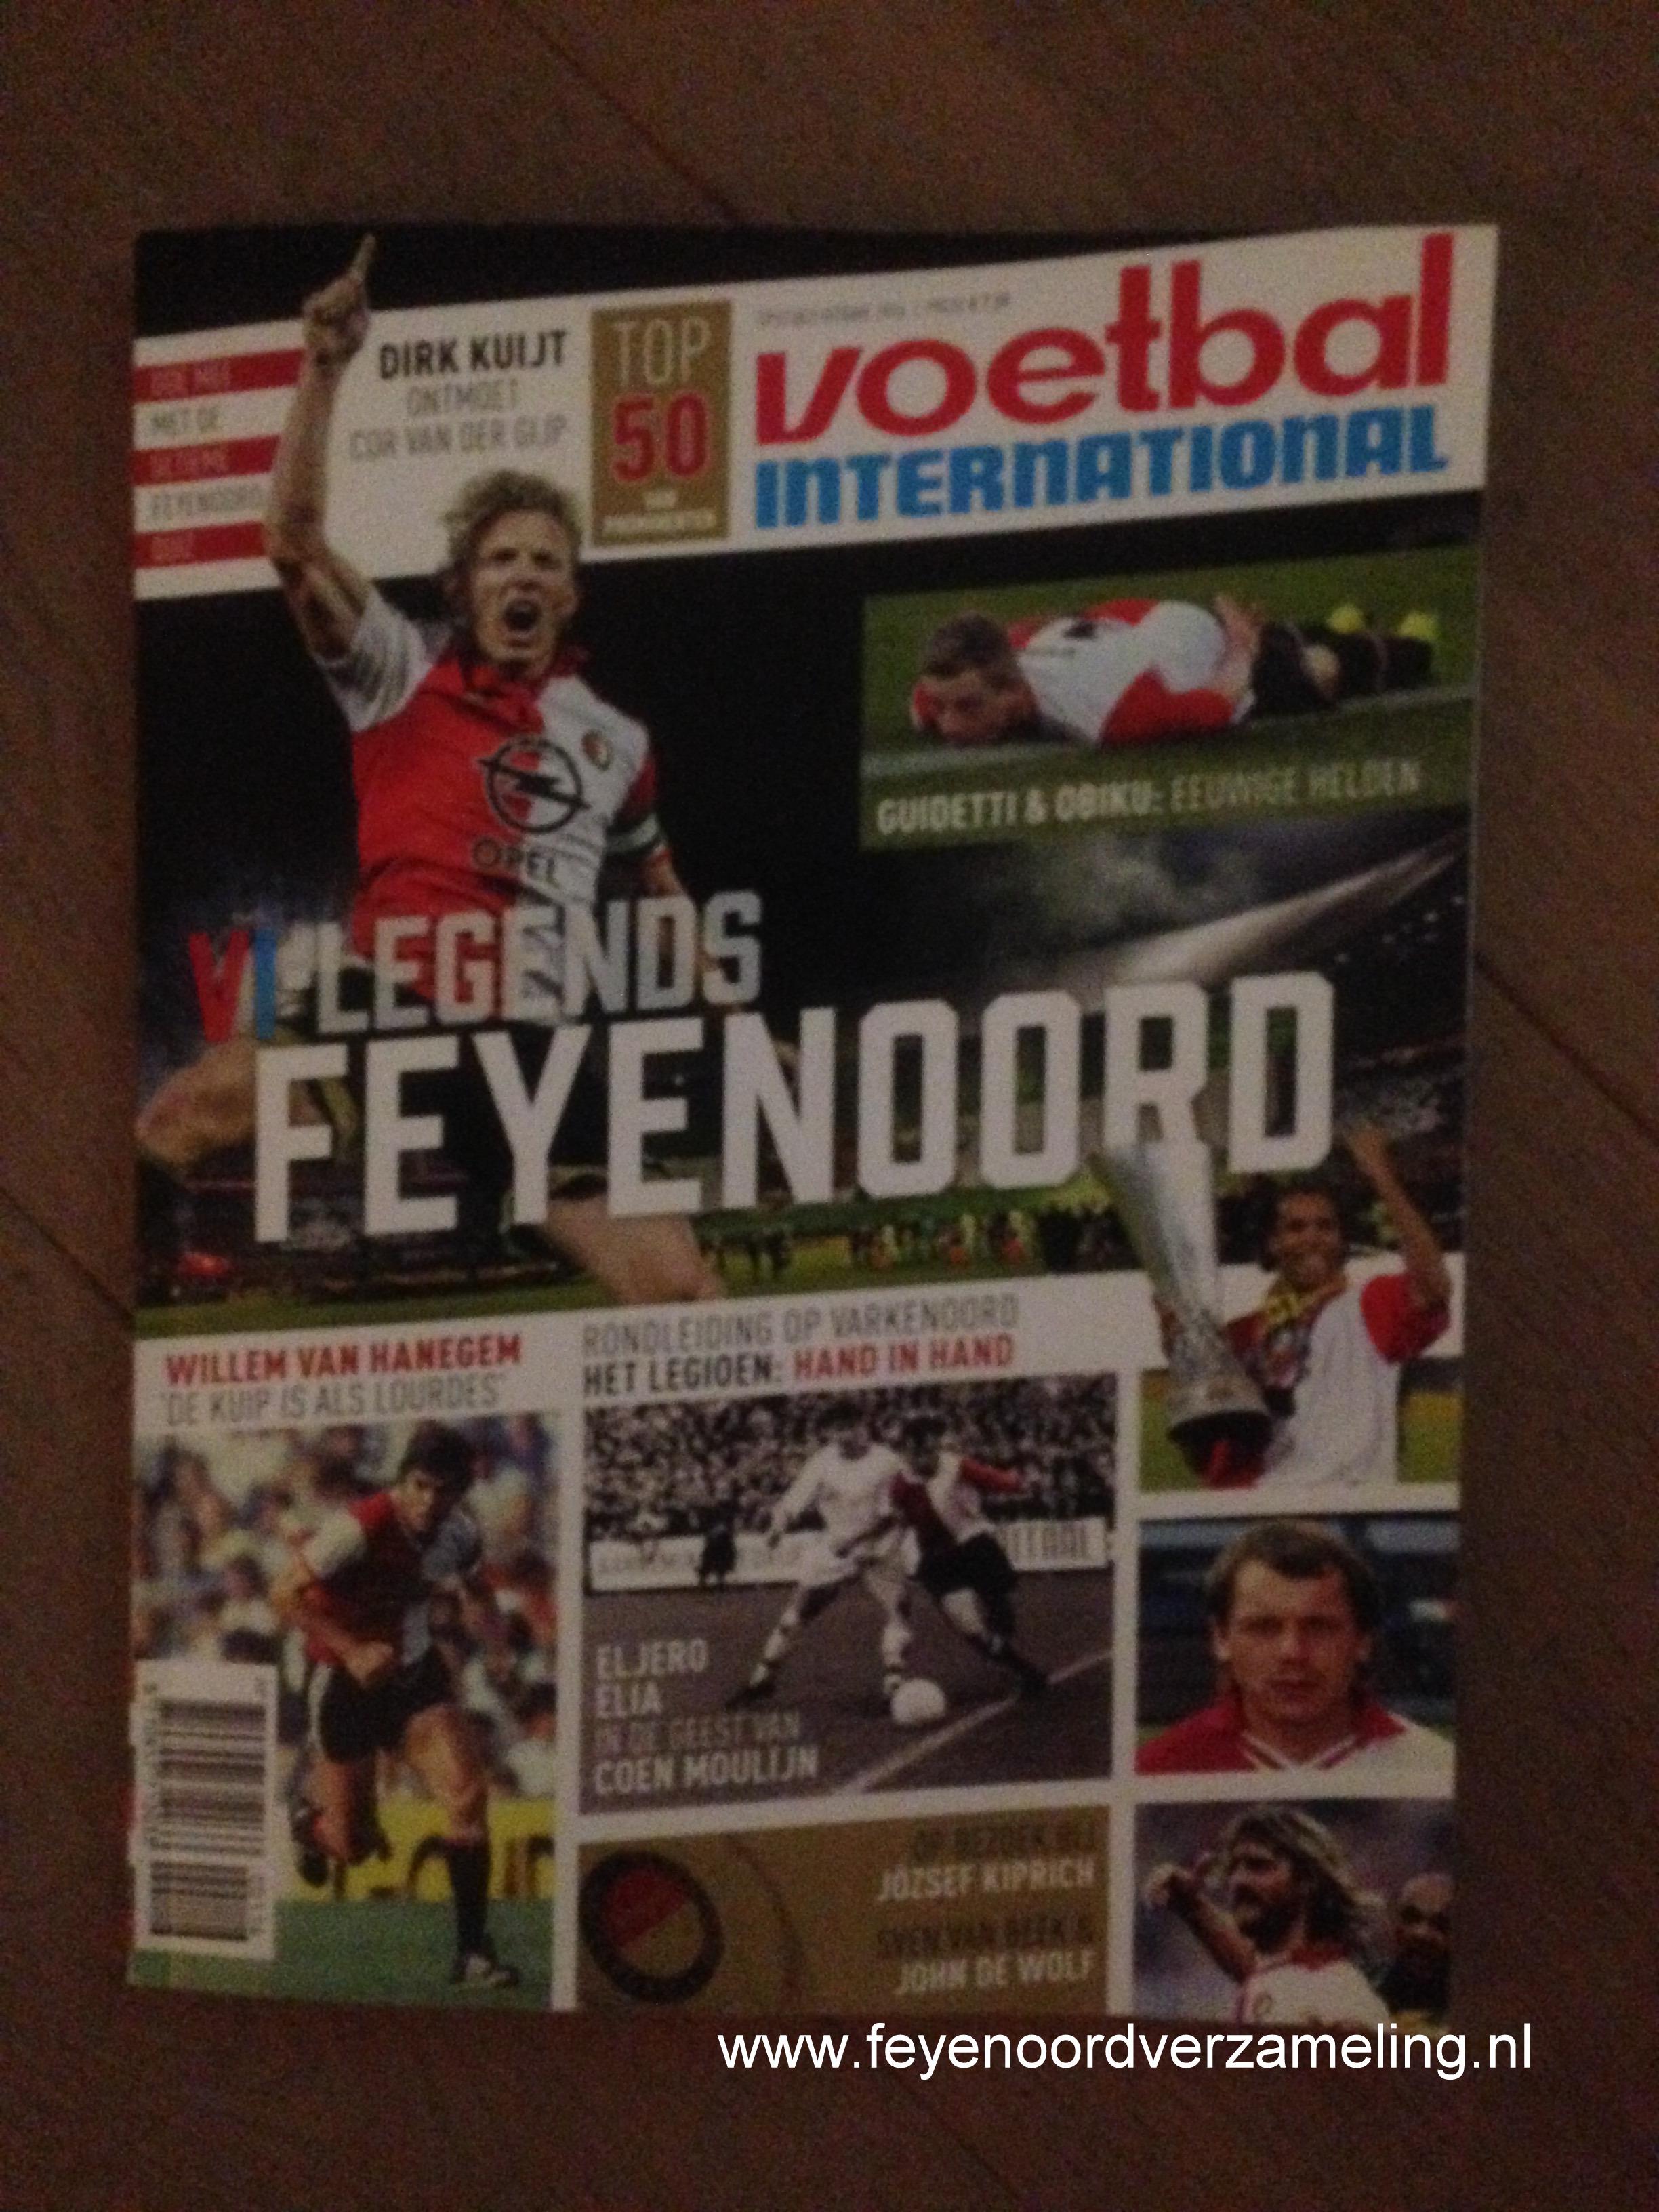 VI Legends: Feyenoord